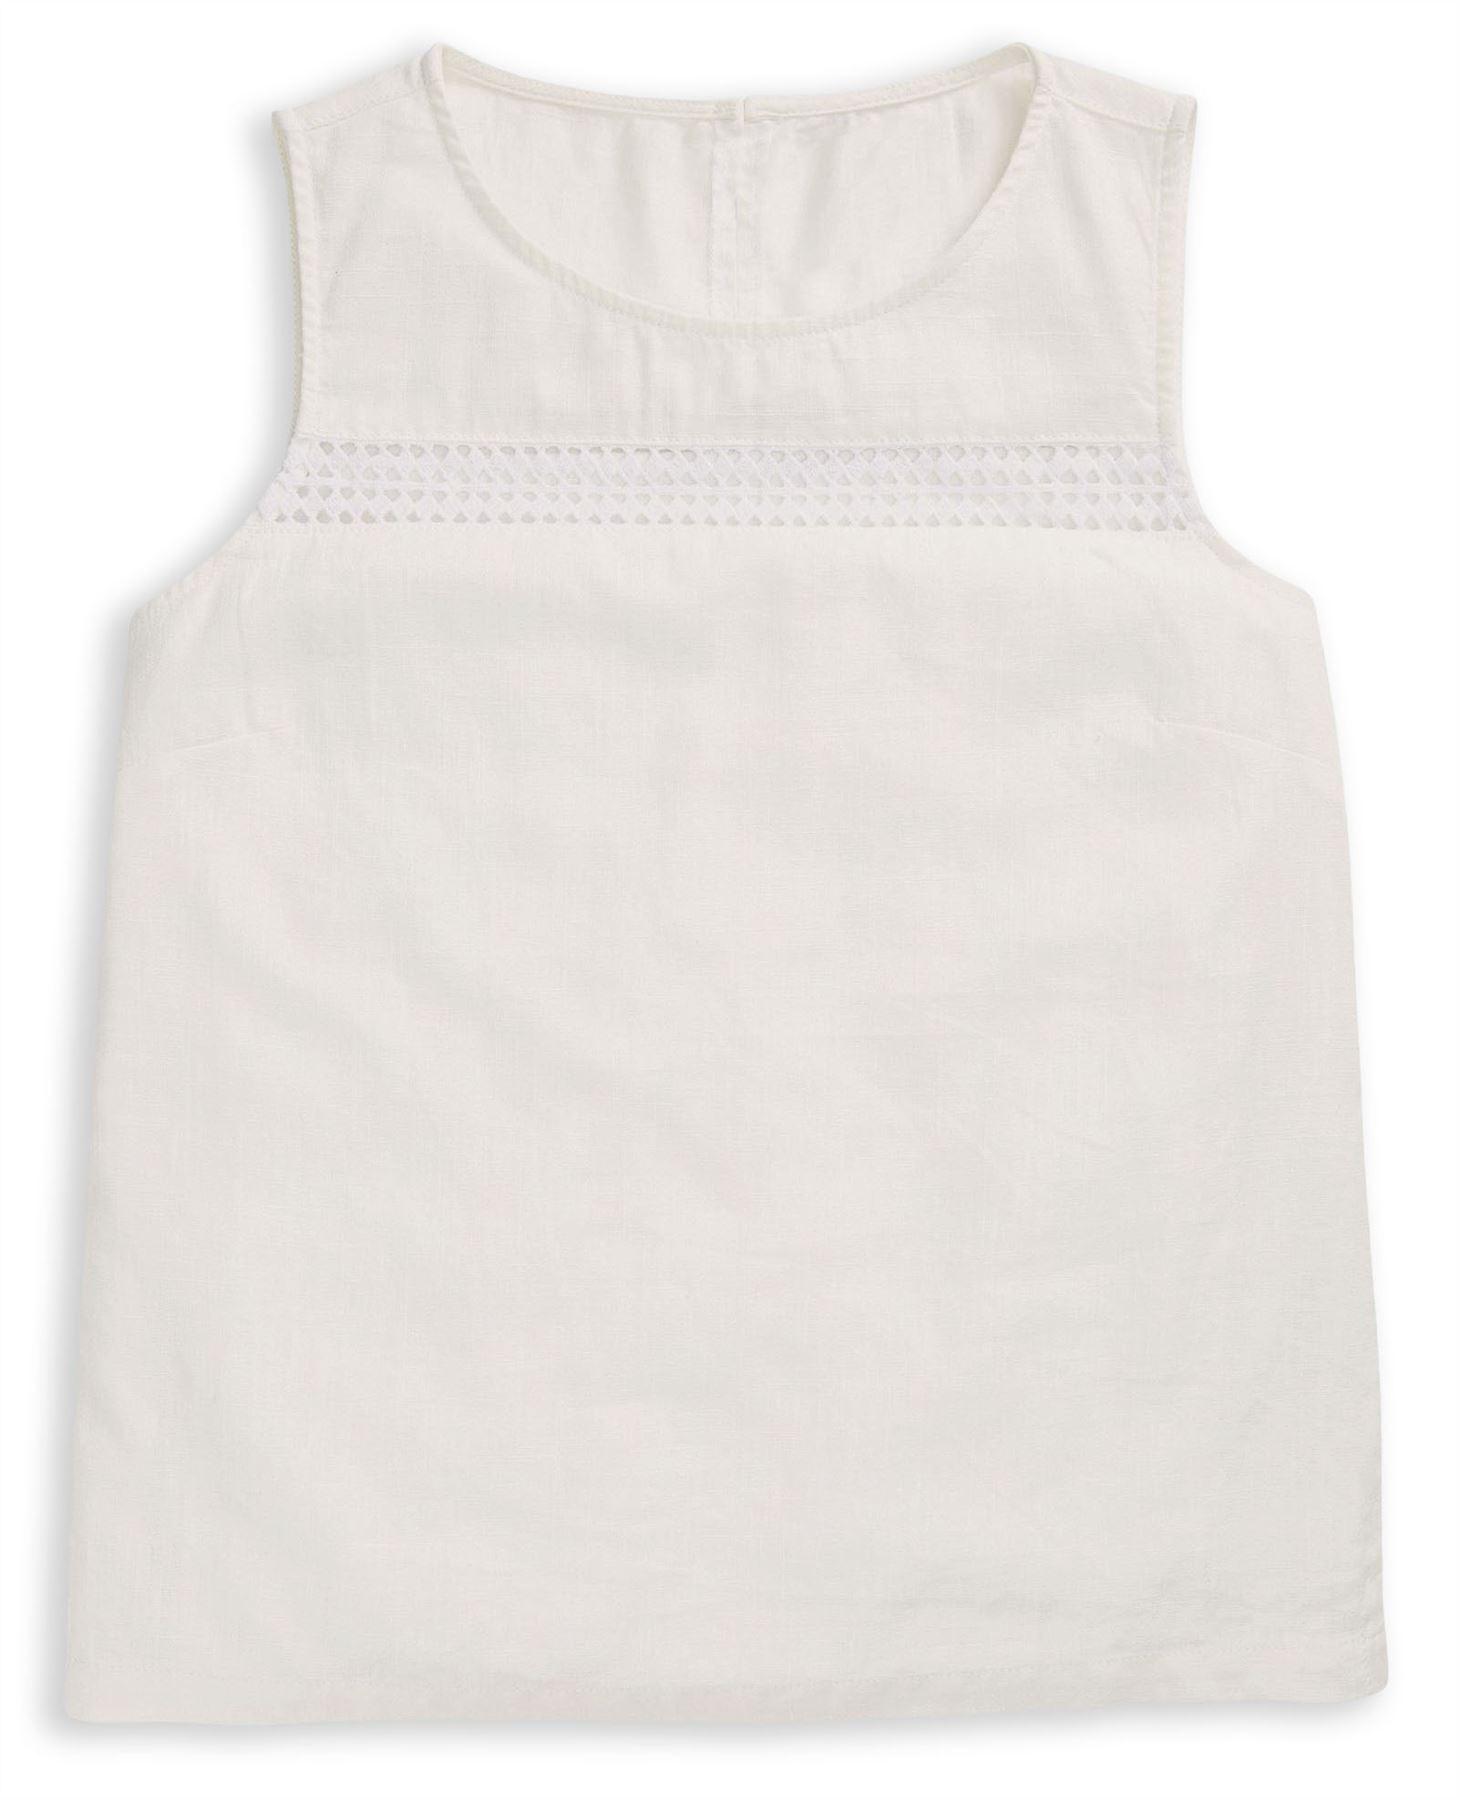 NEXT-Womens-Linen-Sleeveless-Boxy-Top-SALE-RRP-18 thumbnail 25